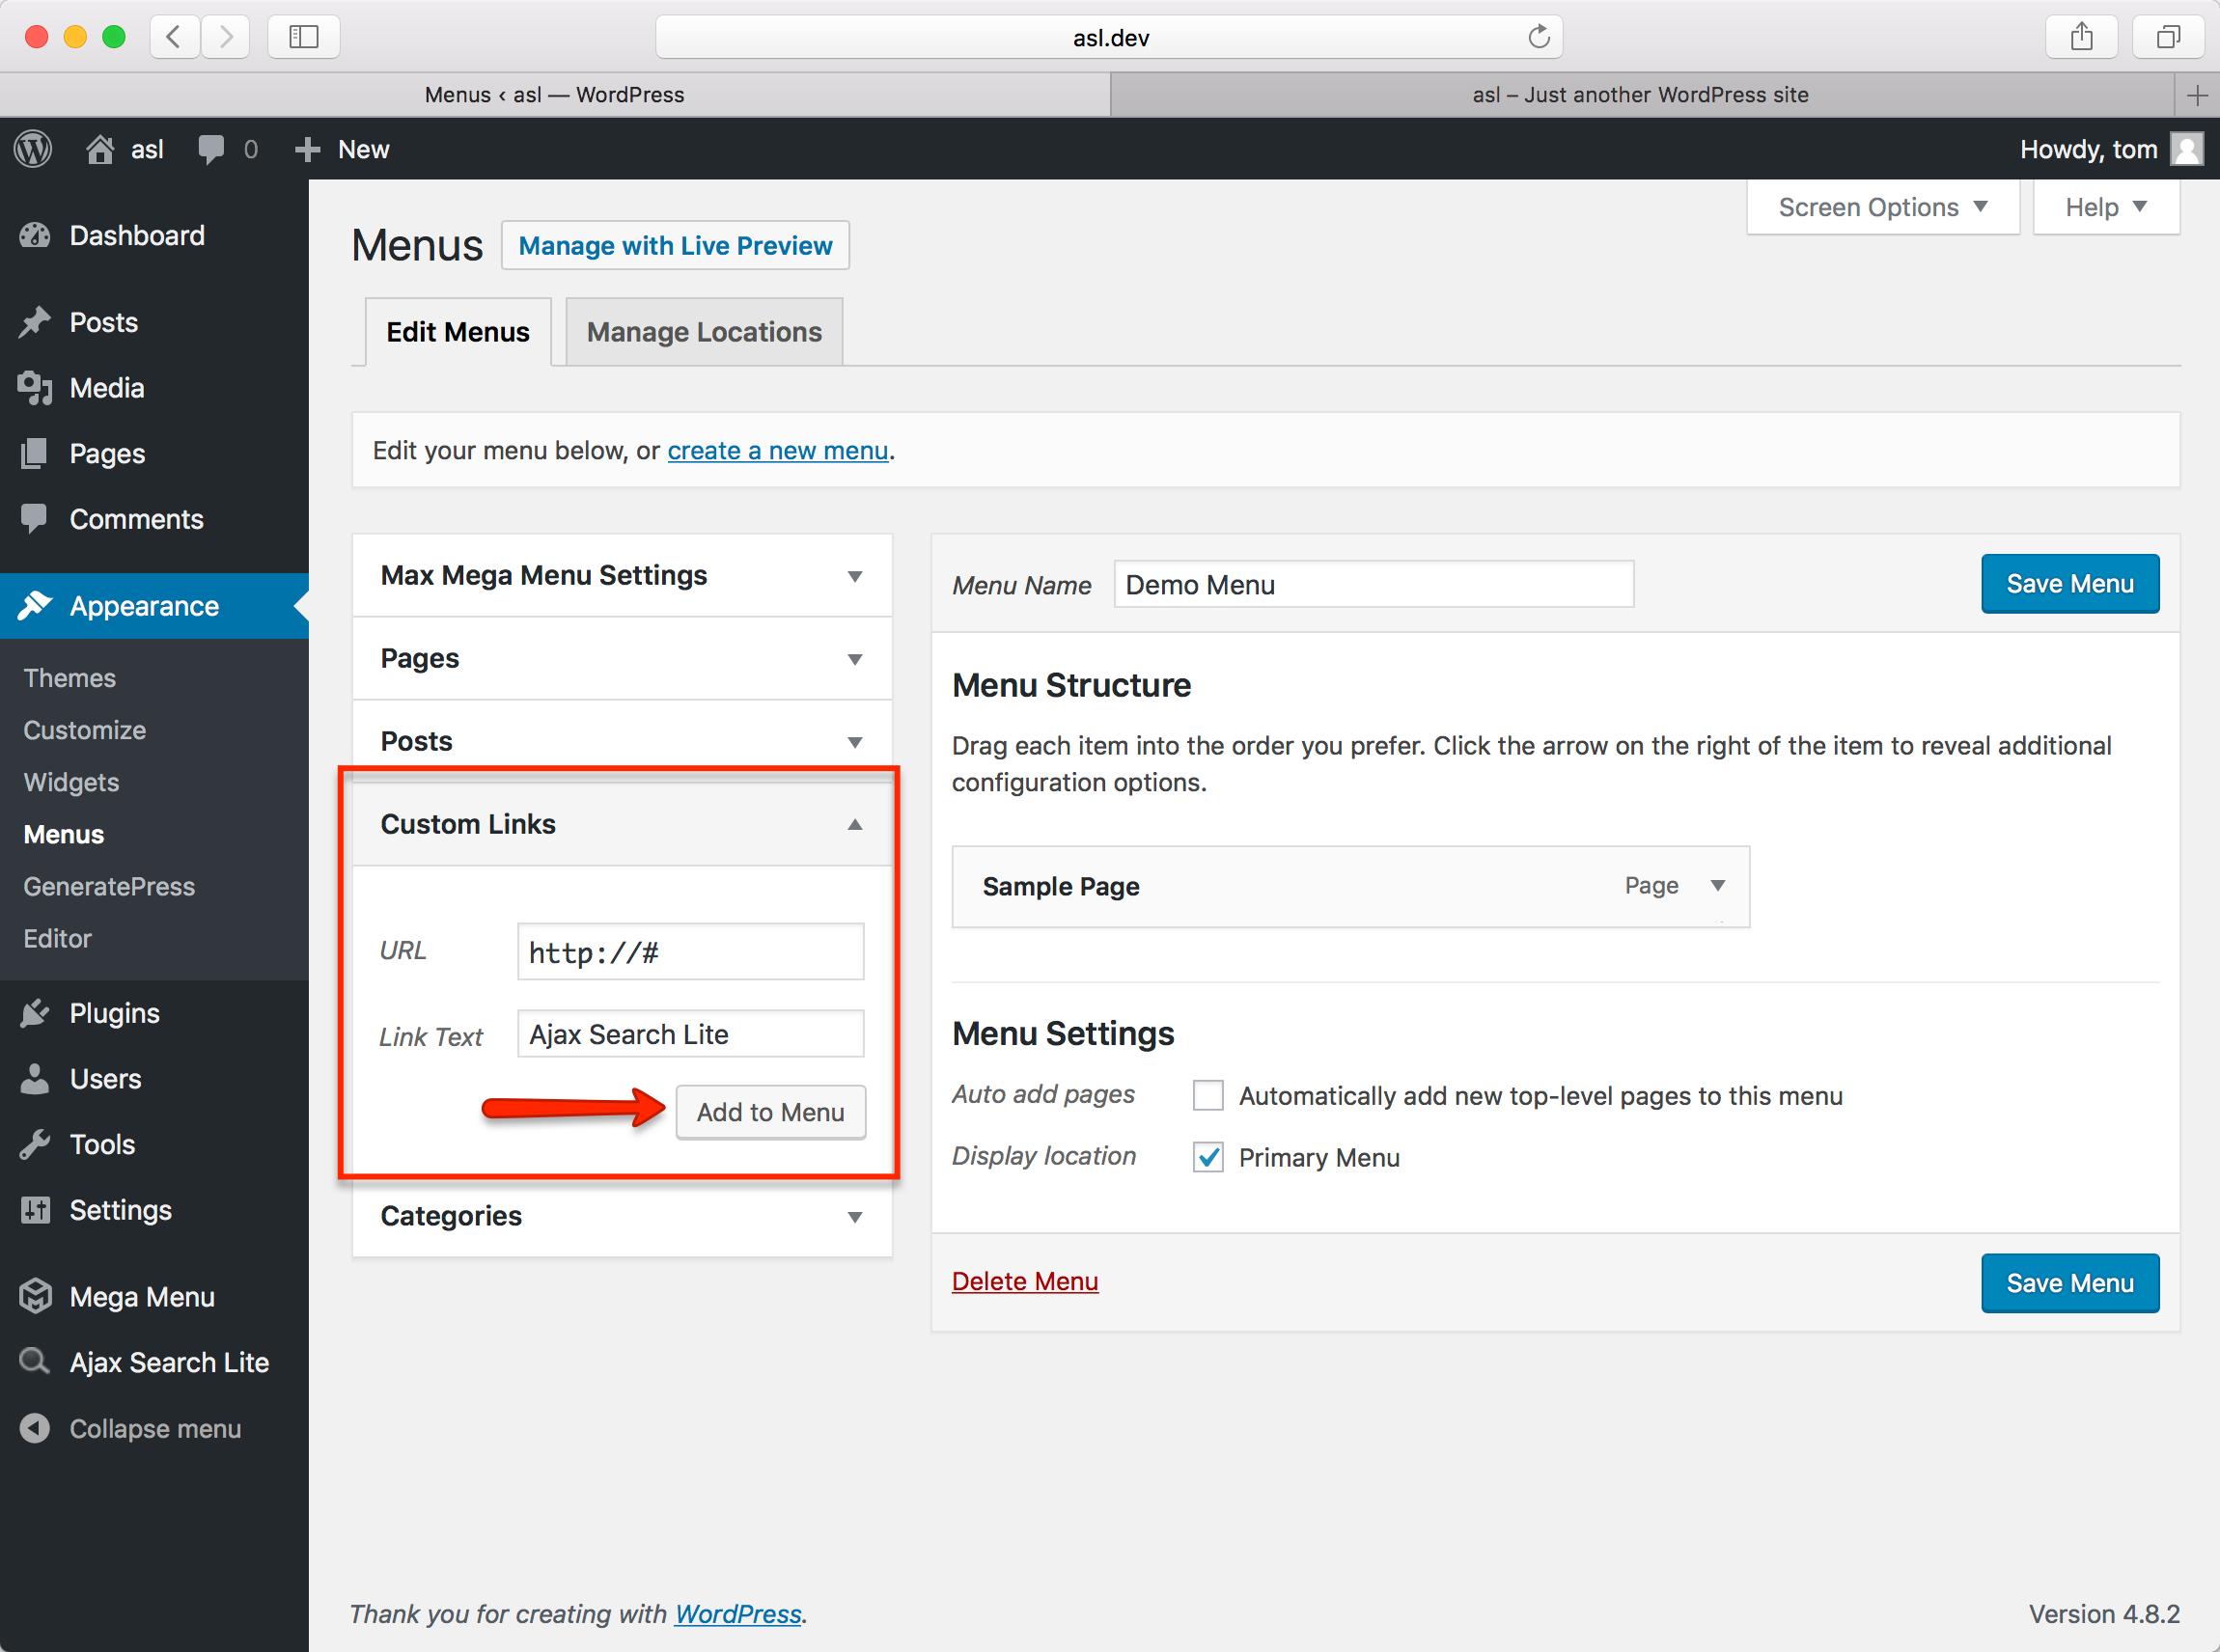 Using Ajax Search Lite/Pro with Max Mega Menu – Max Mega Menu